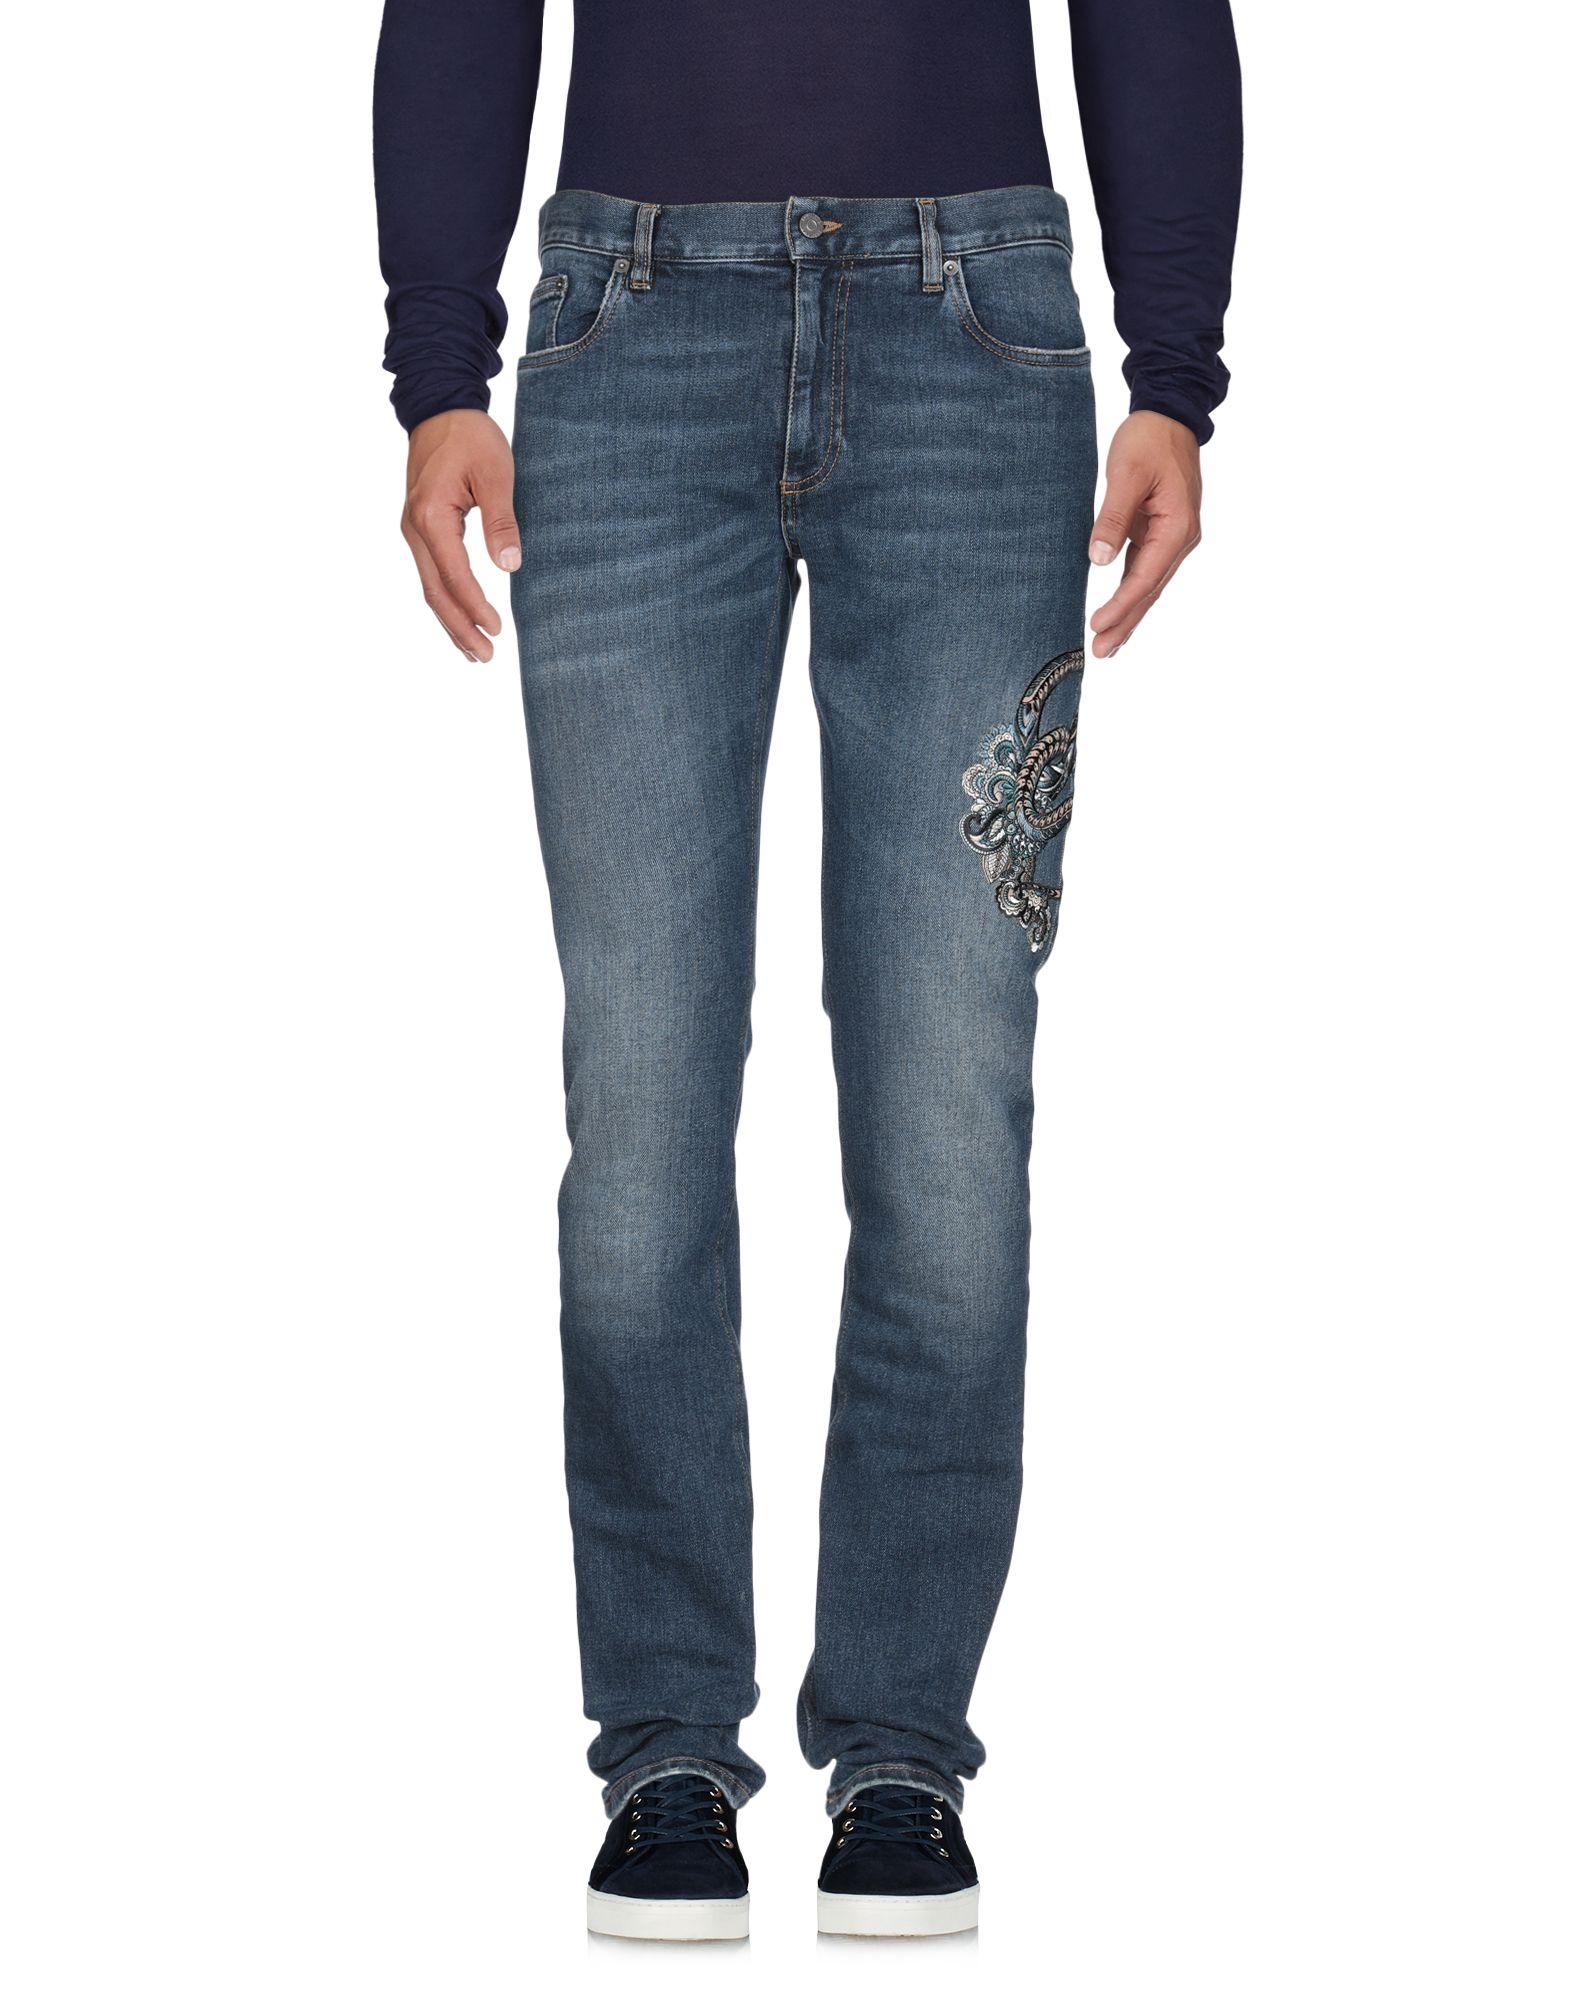 Pantaloni Jeans Roberto 42683982UJ Cavalli Uomo - 42683982UJ Roberto 725e4d